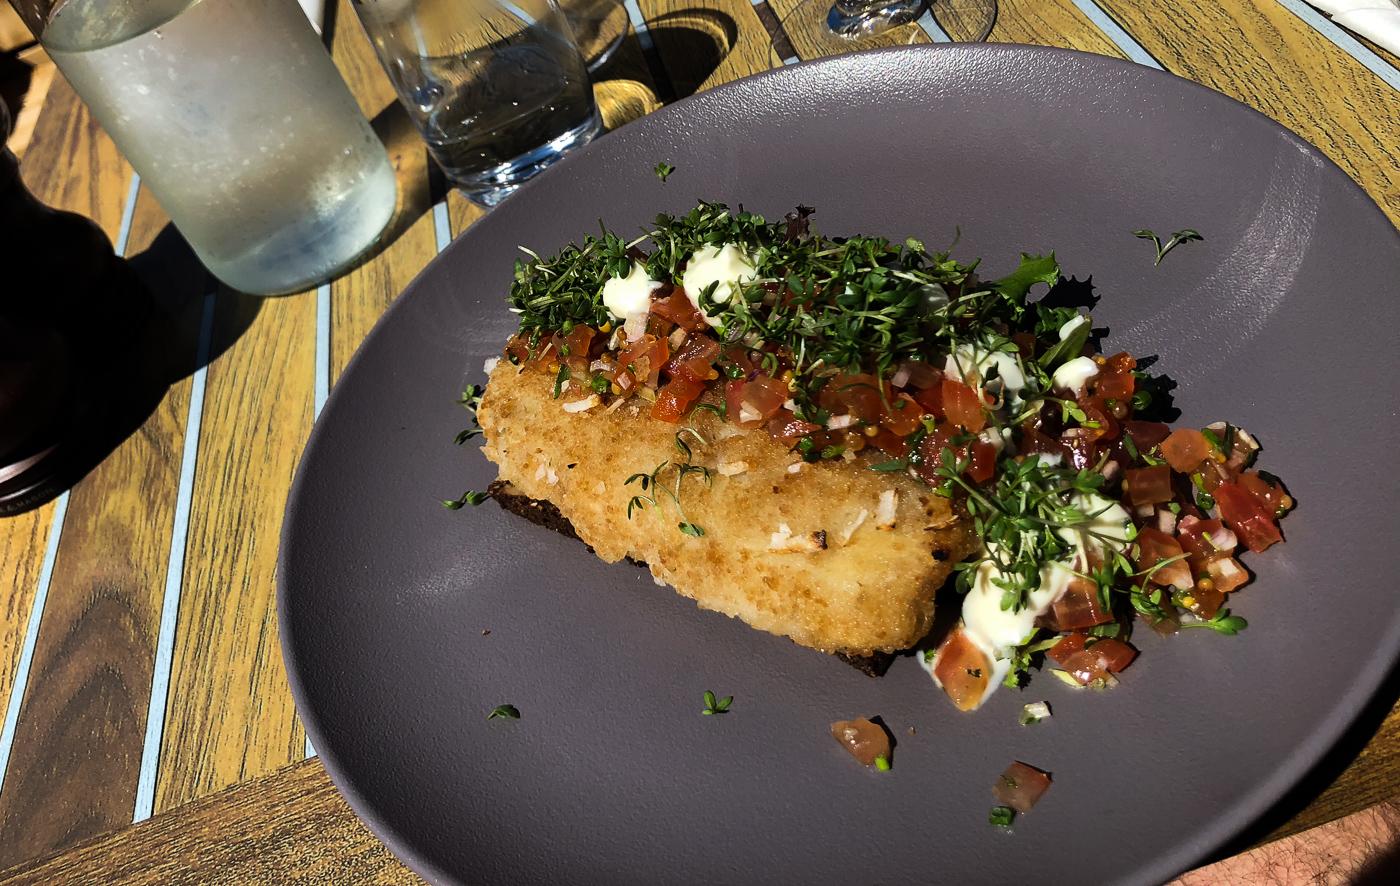 Madanmeldelse: Sommerfrokosten på Norsminde Kro - en fast tradition